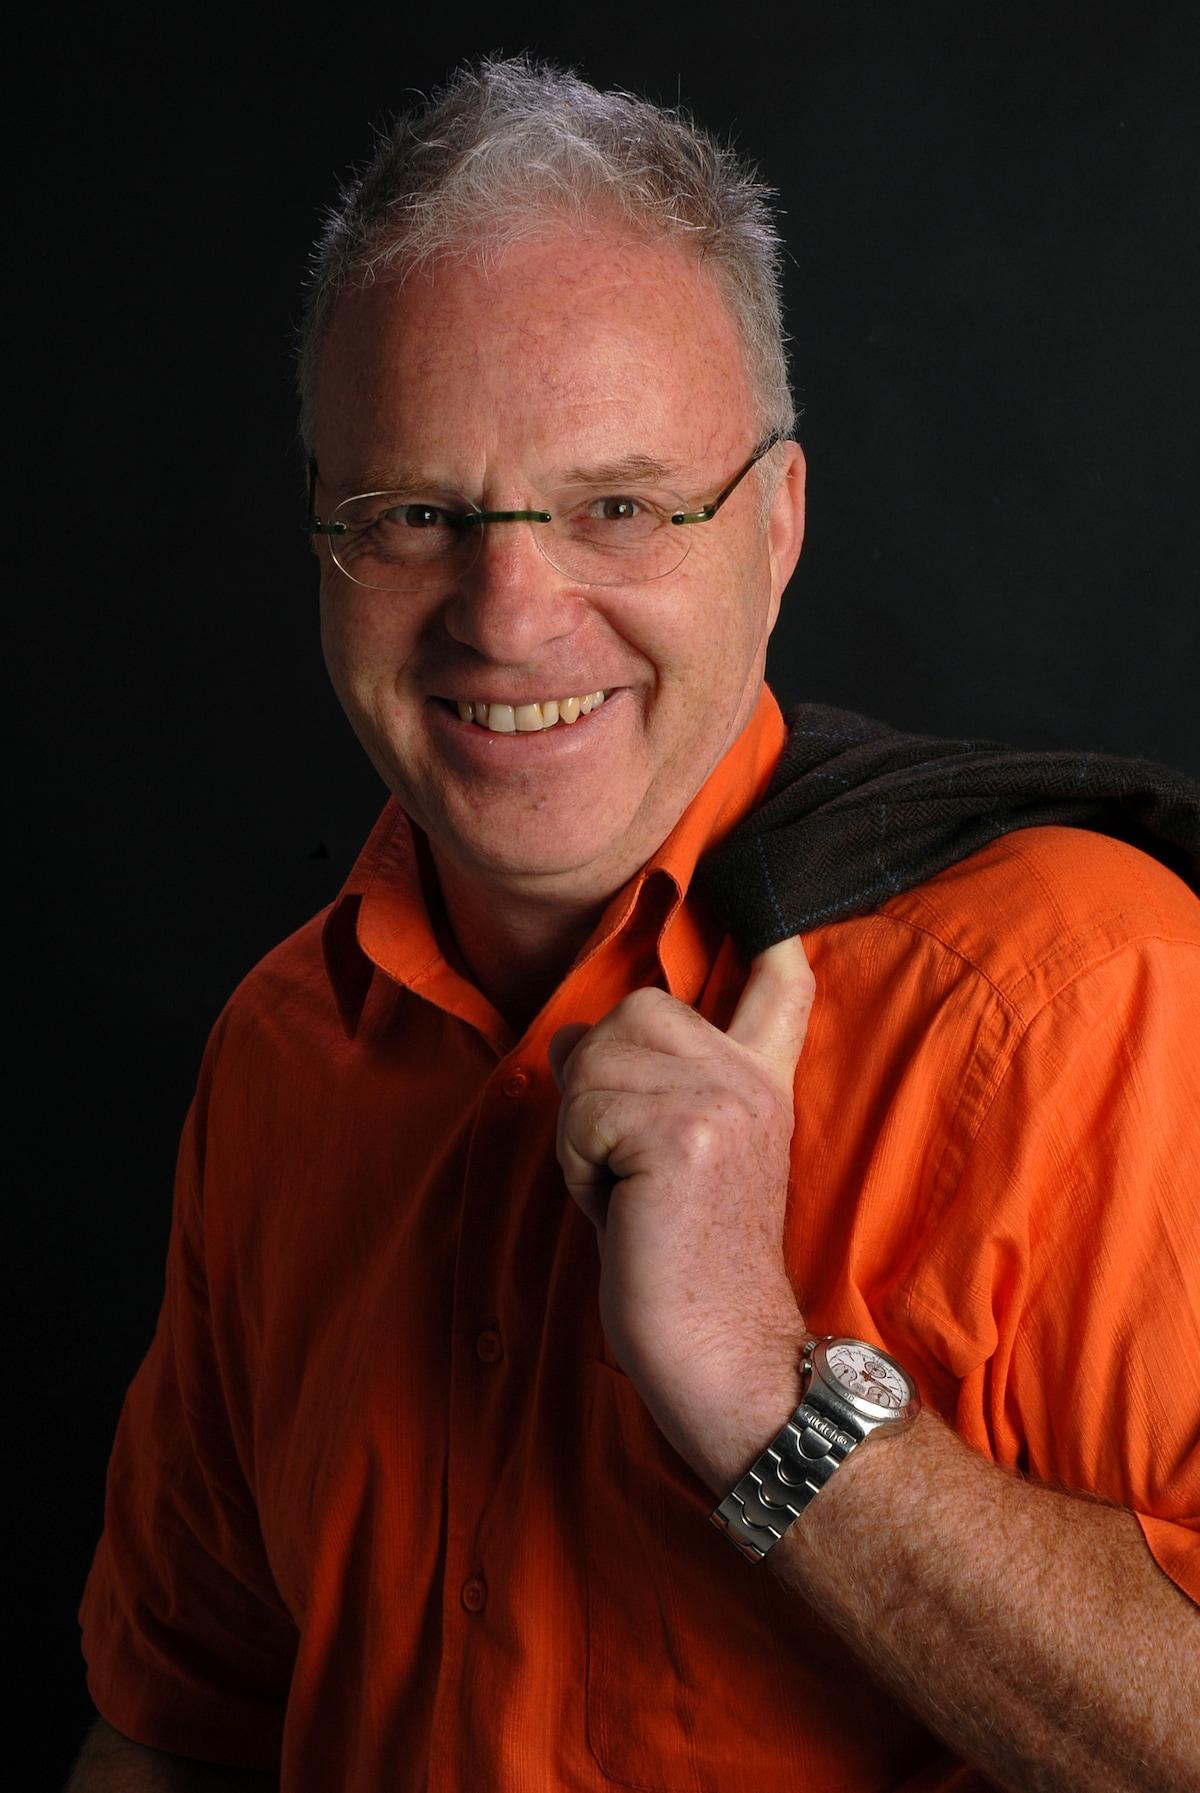 Christian from Rümlang